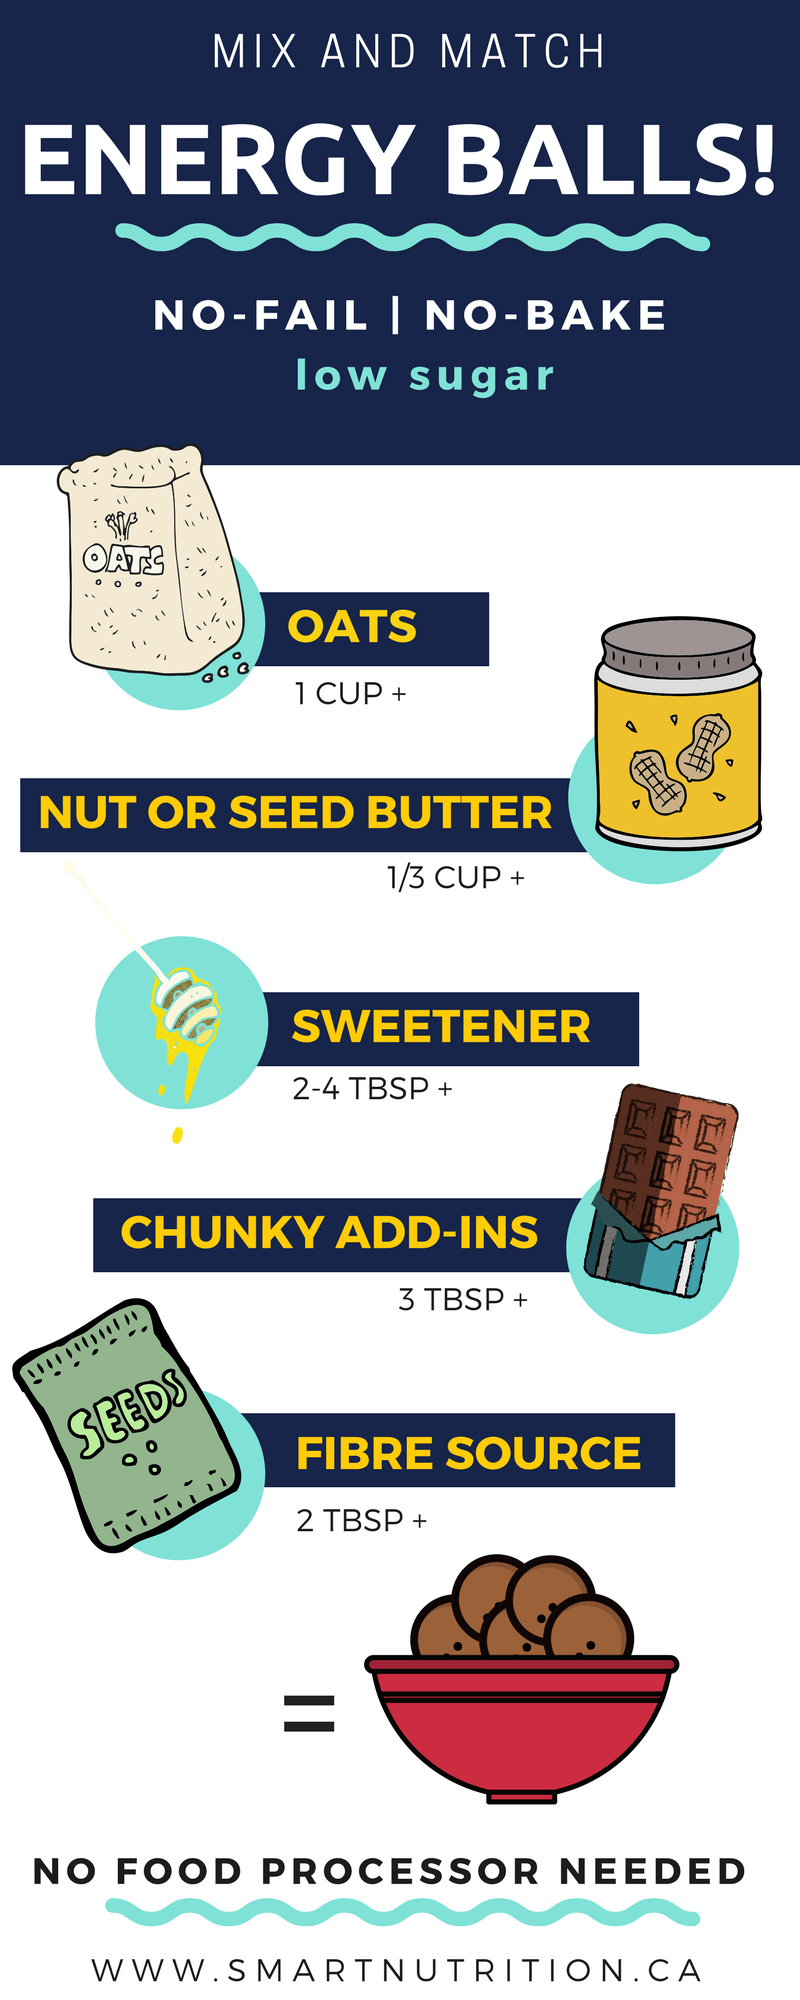 Energy ball mix 'n match recipe (low sugar, no bake)